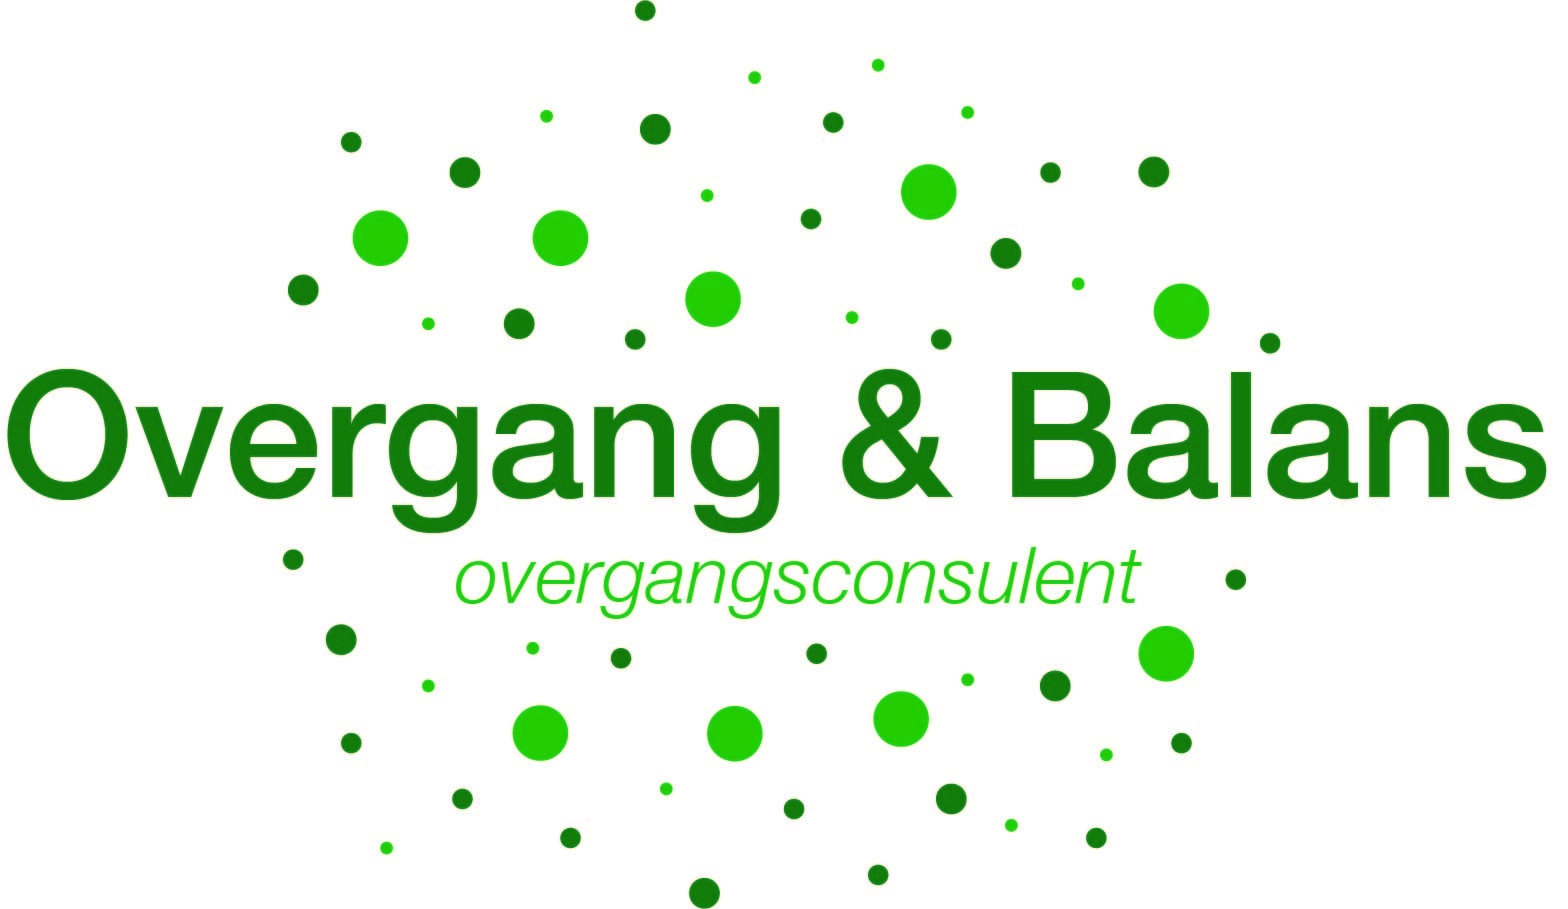 Overgang & Balans